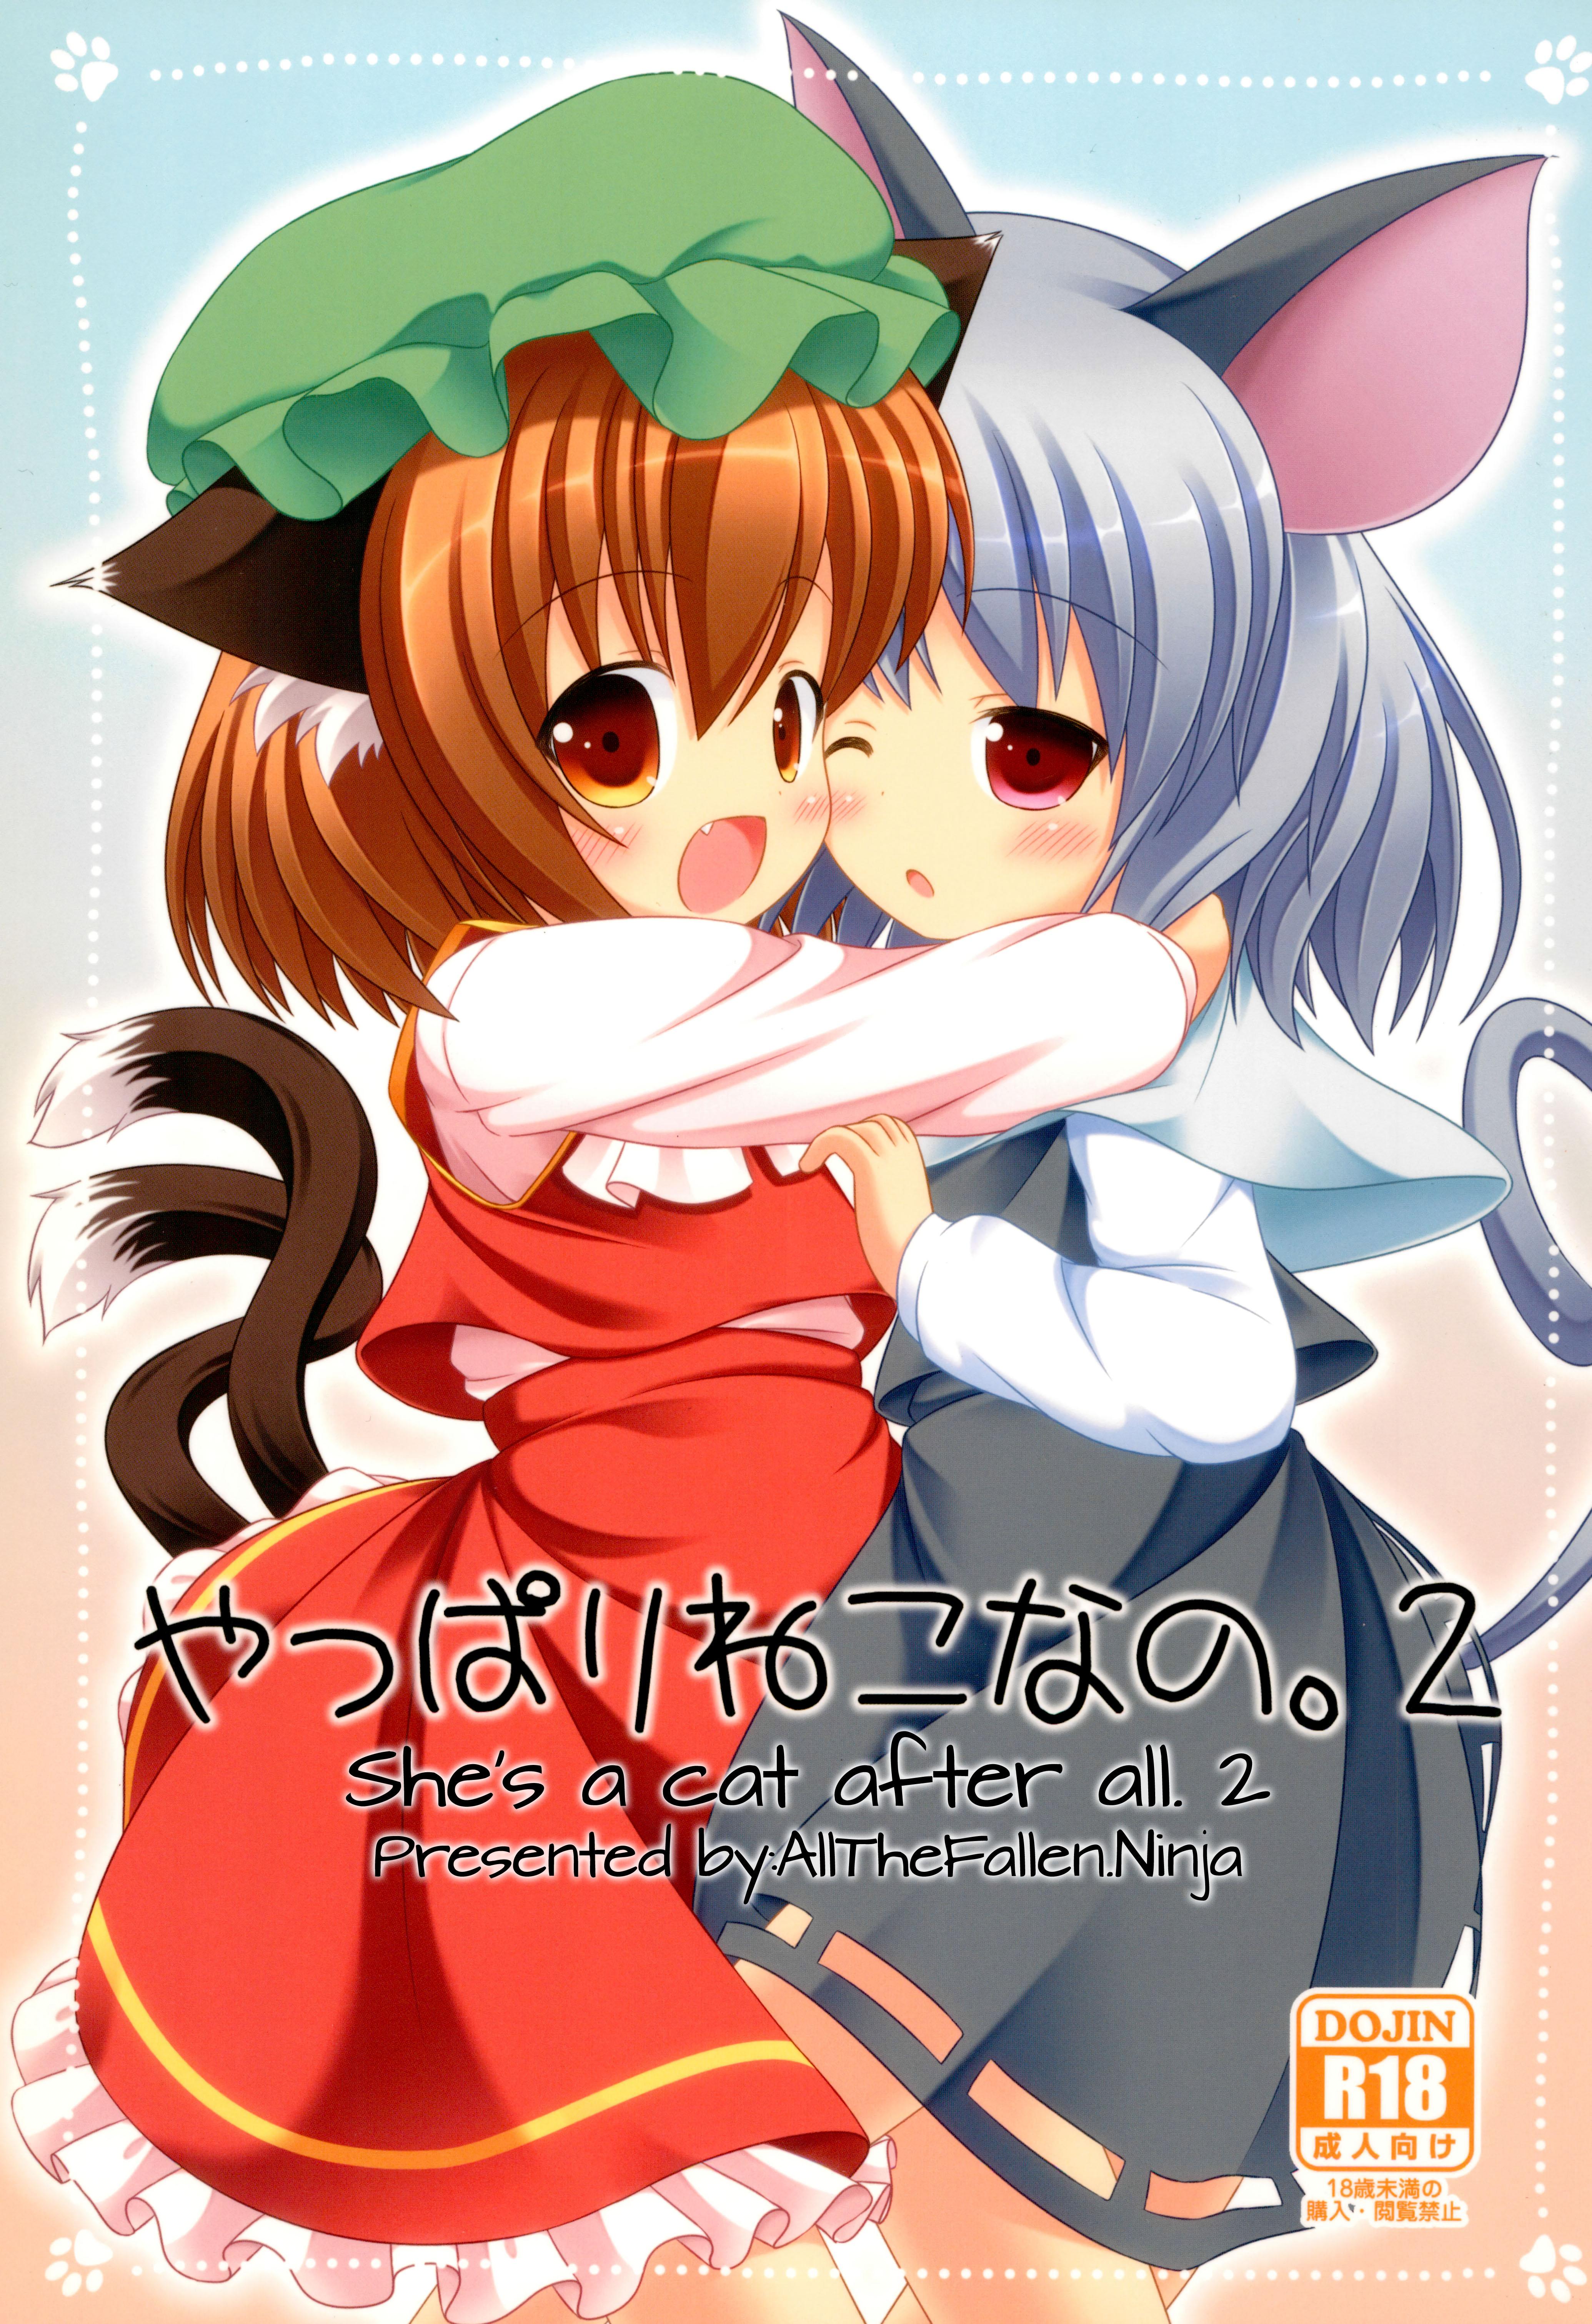 Yappari Neko nano. 2 | She's a cat after all. 2